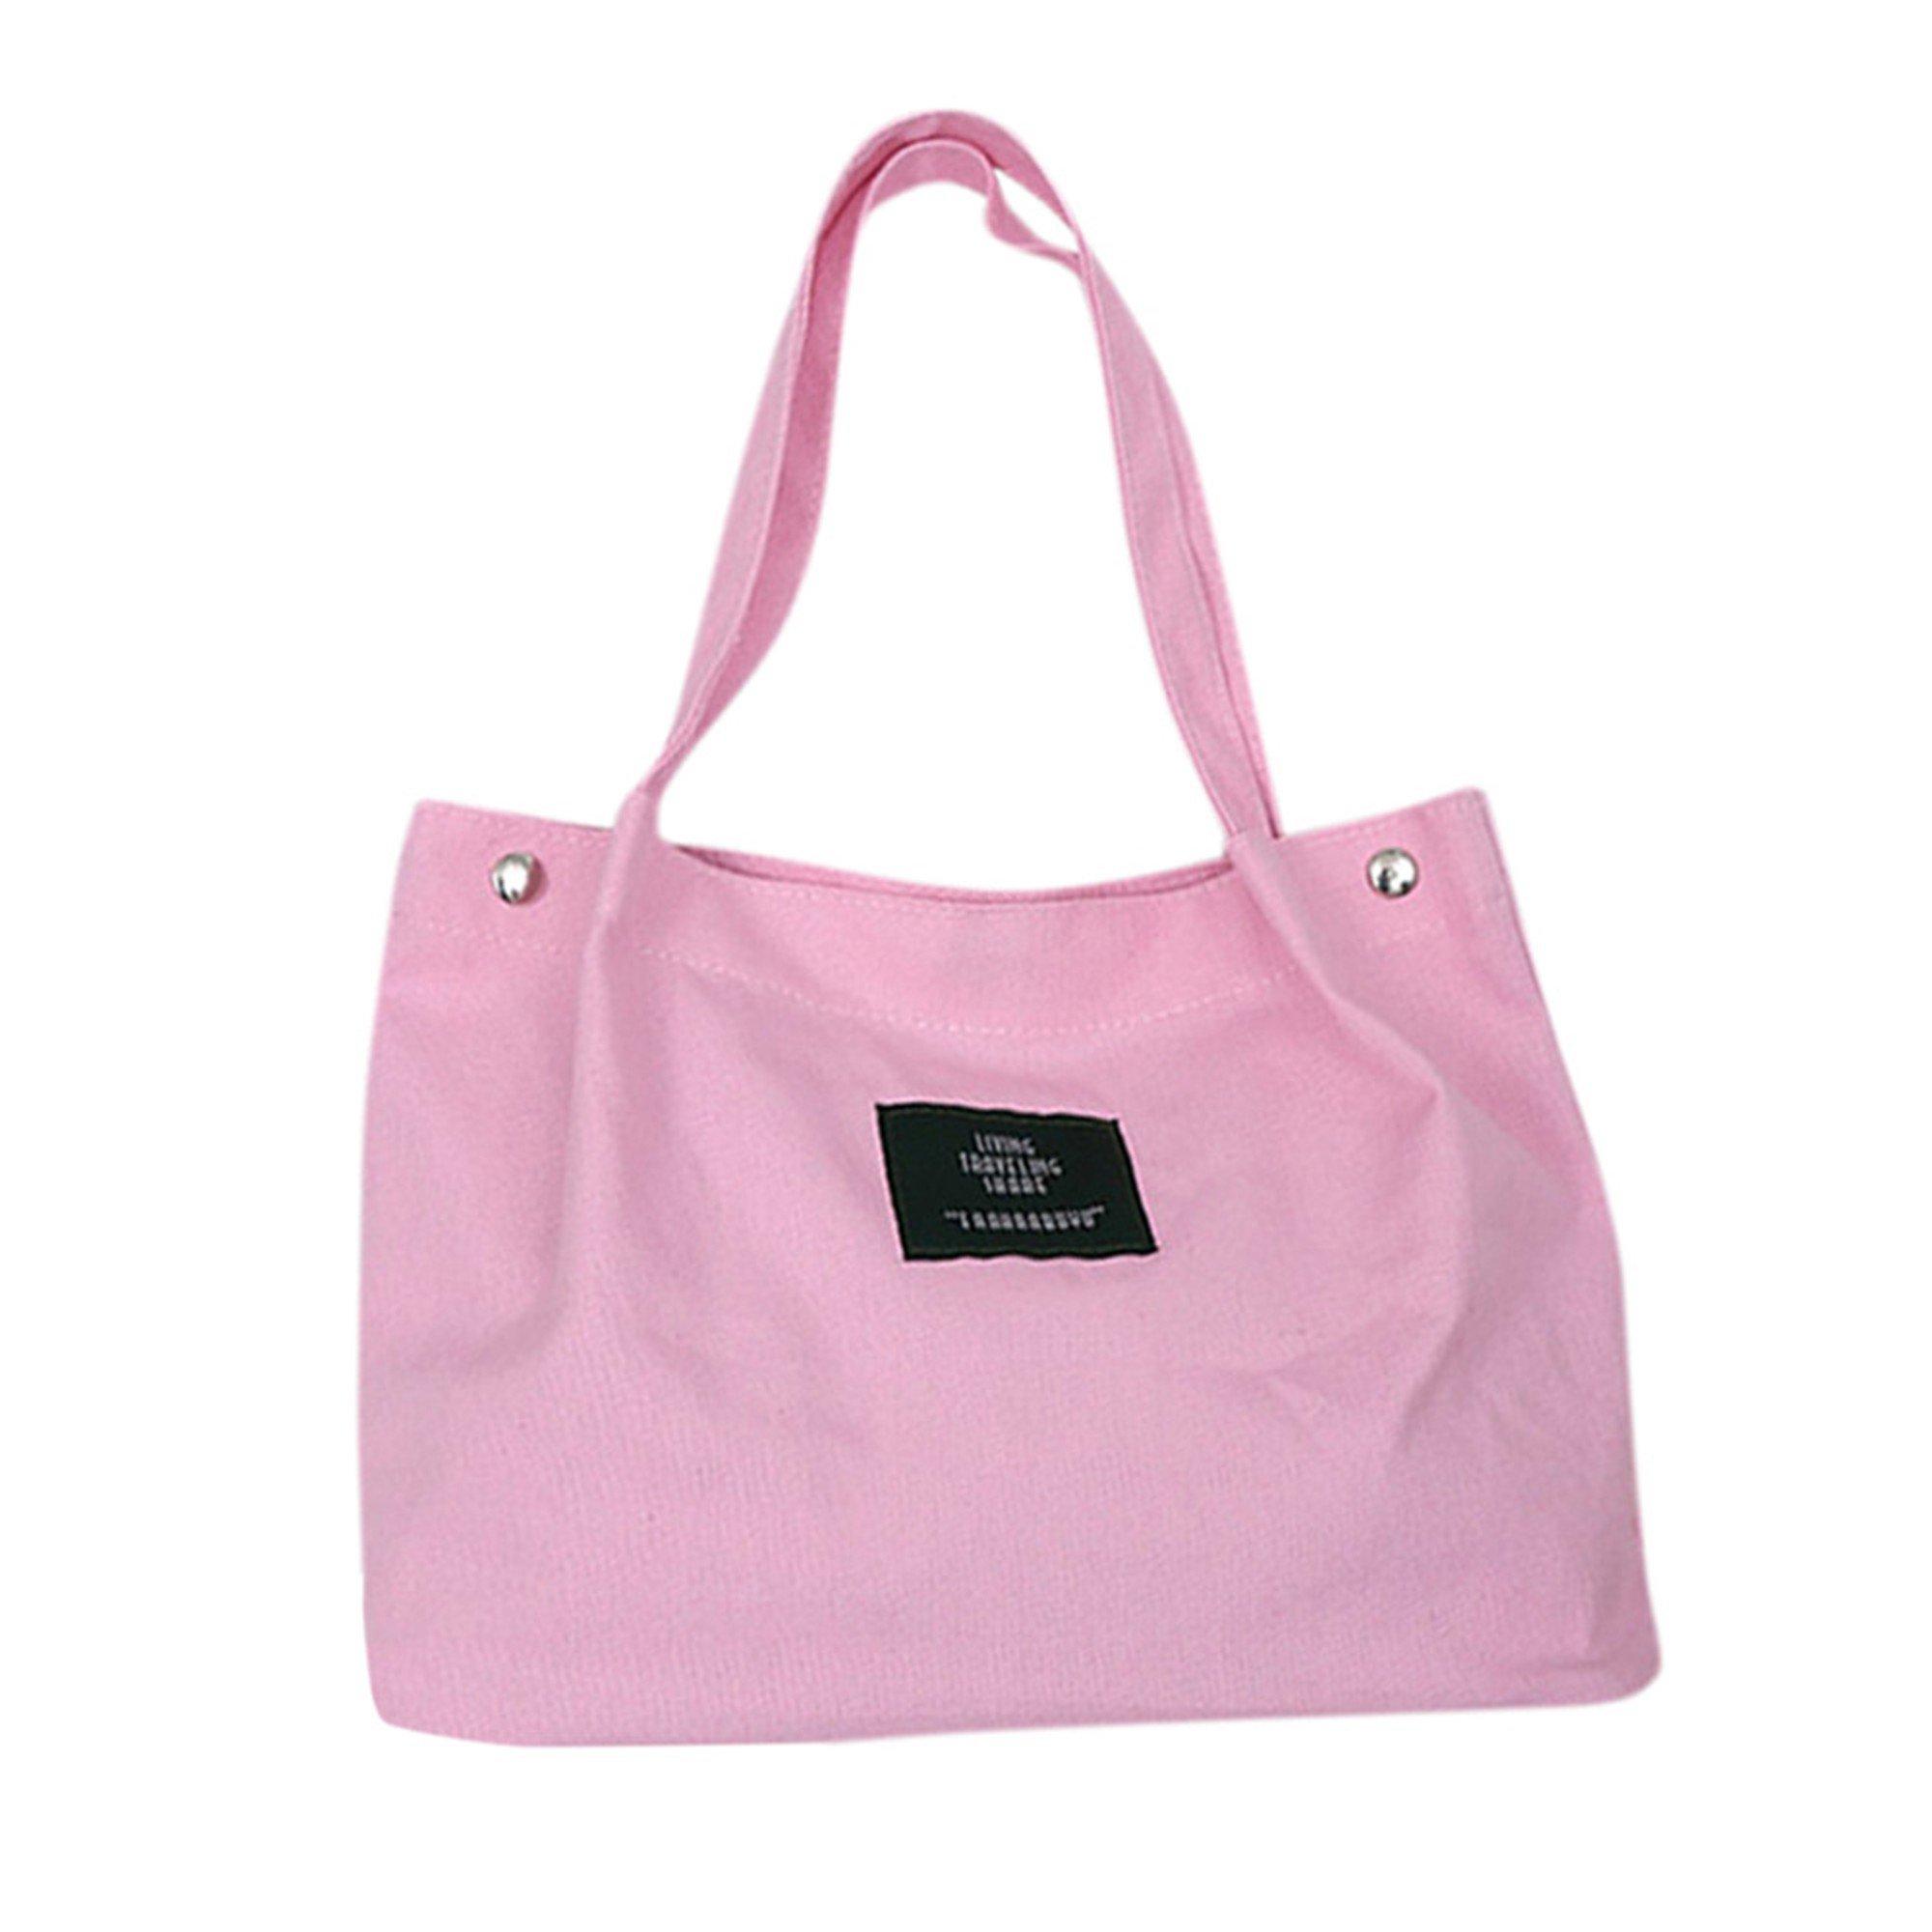 SFE-Shopping Bag,Canvas Tote,Bag Shopping Bag Tote,Clear Shopping Bag Security Work Tote Shoulder Bag Womens Handbag (Pink)